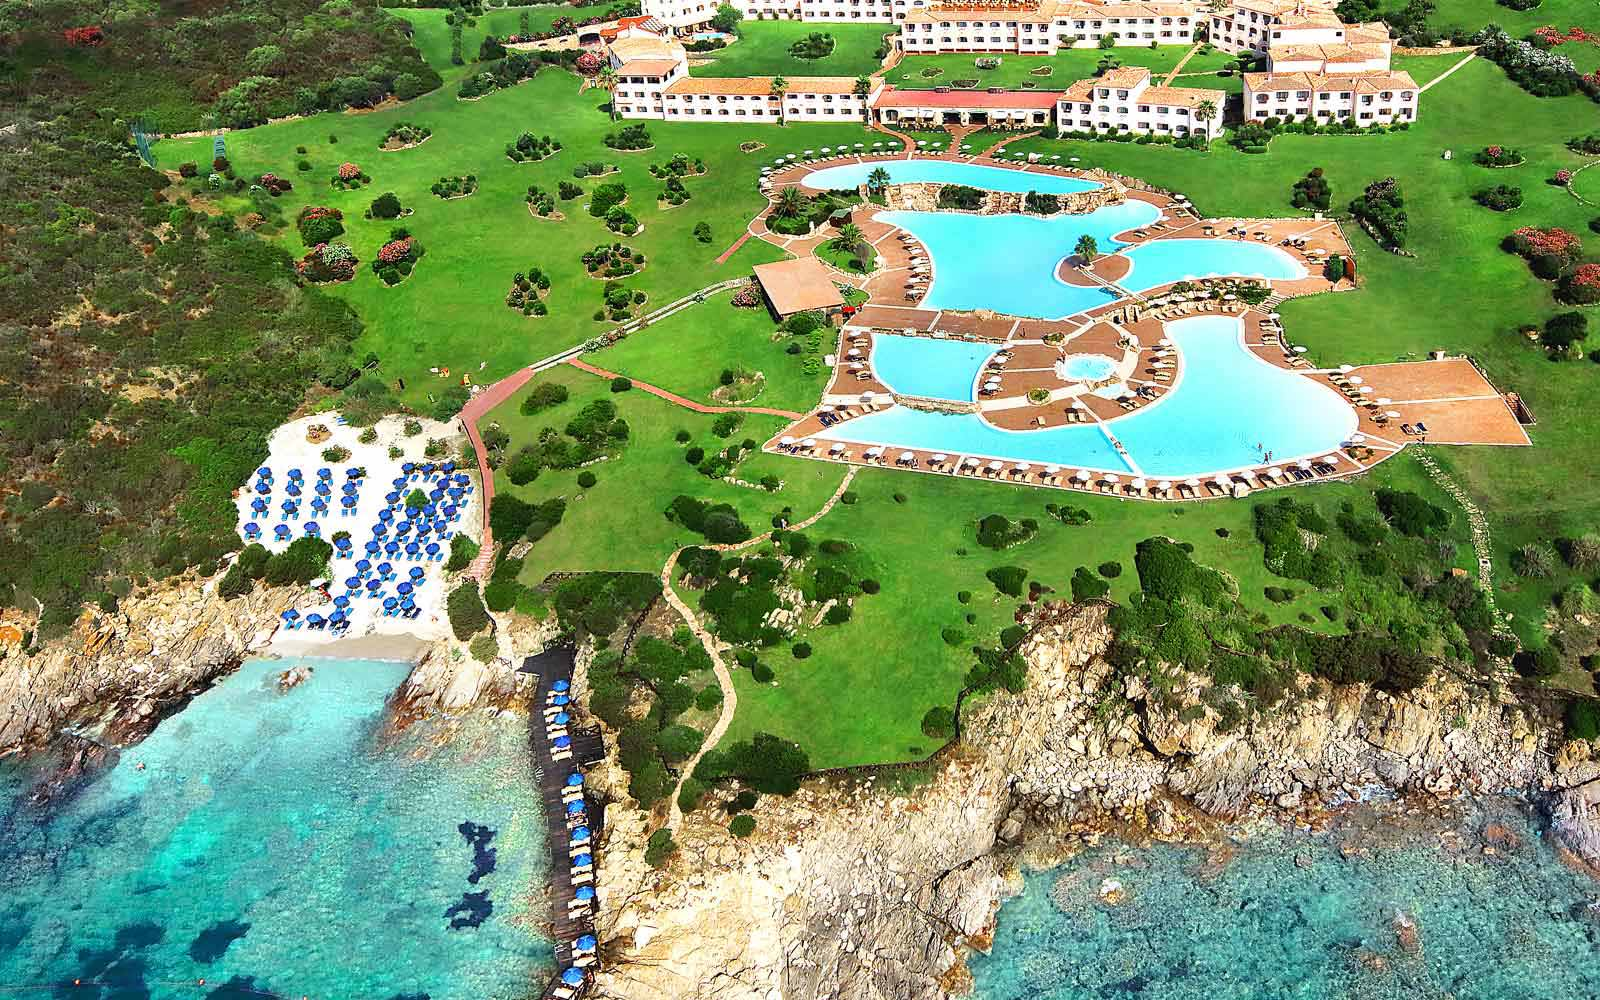 Colonna Resort aerial view